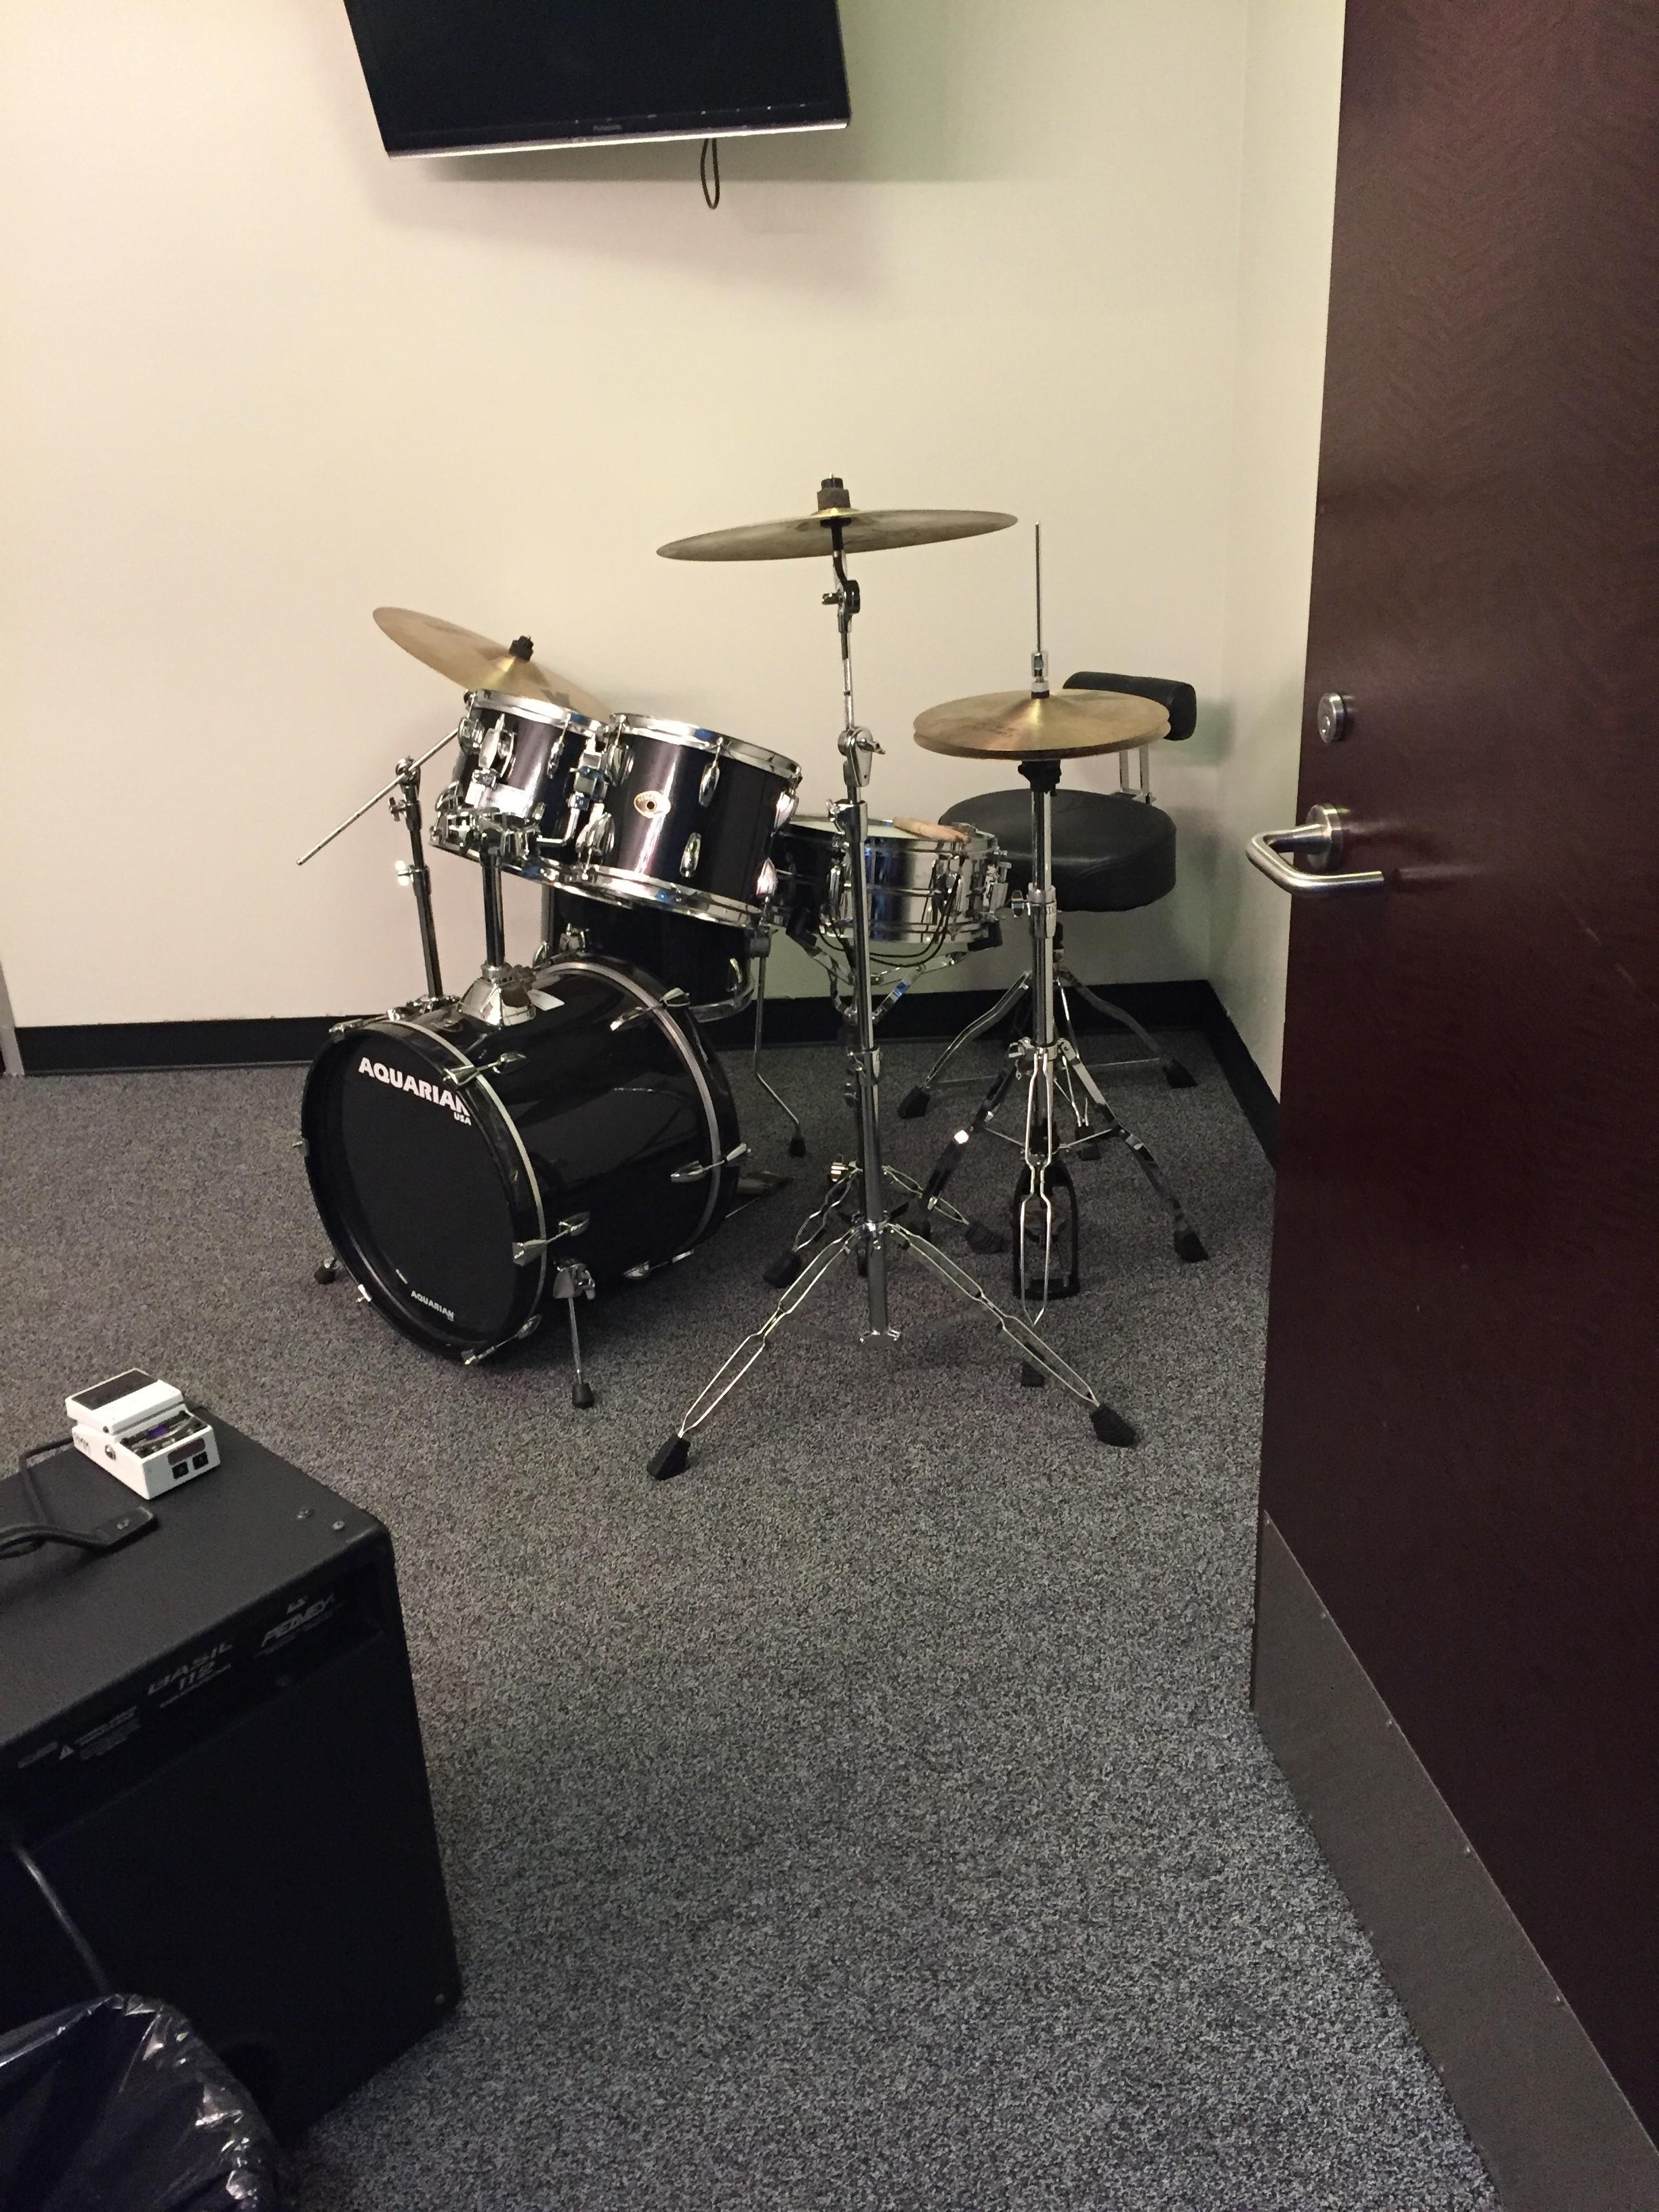 Roger's practice set